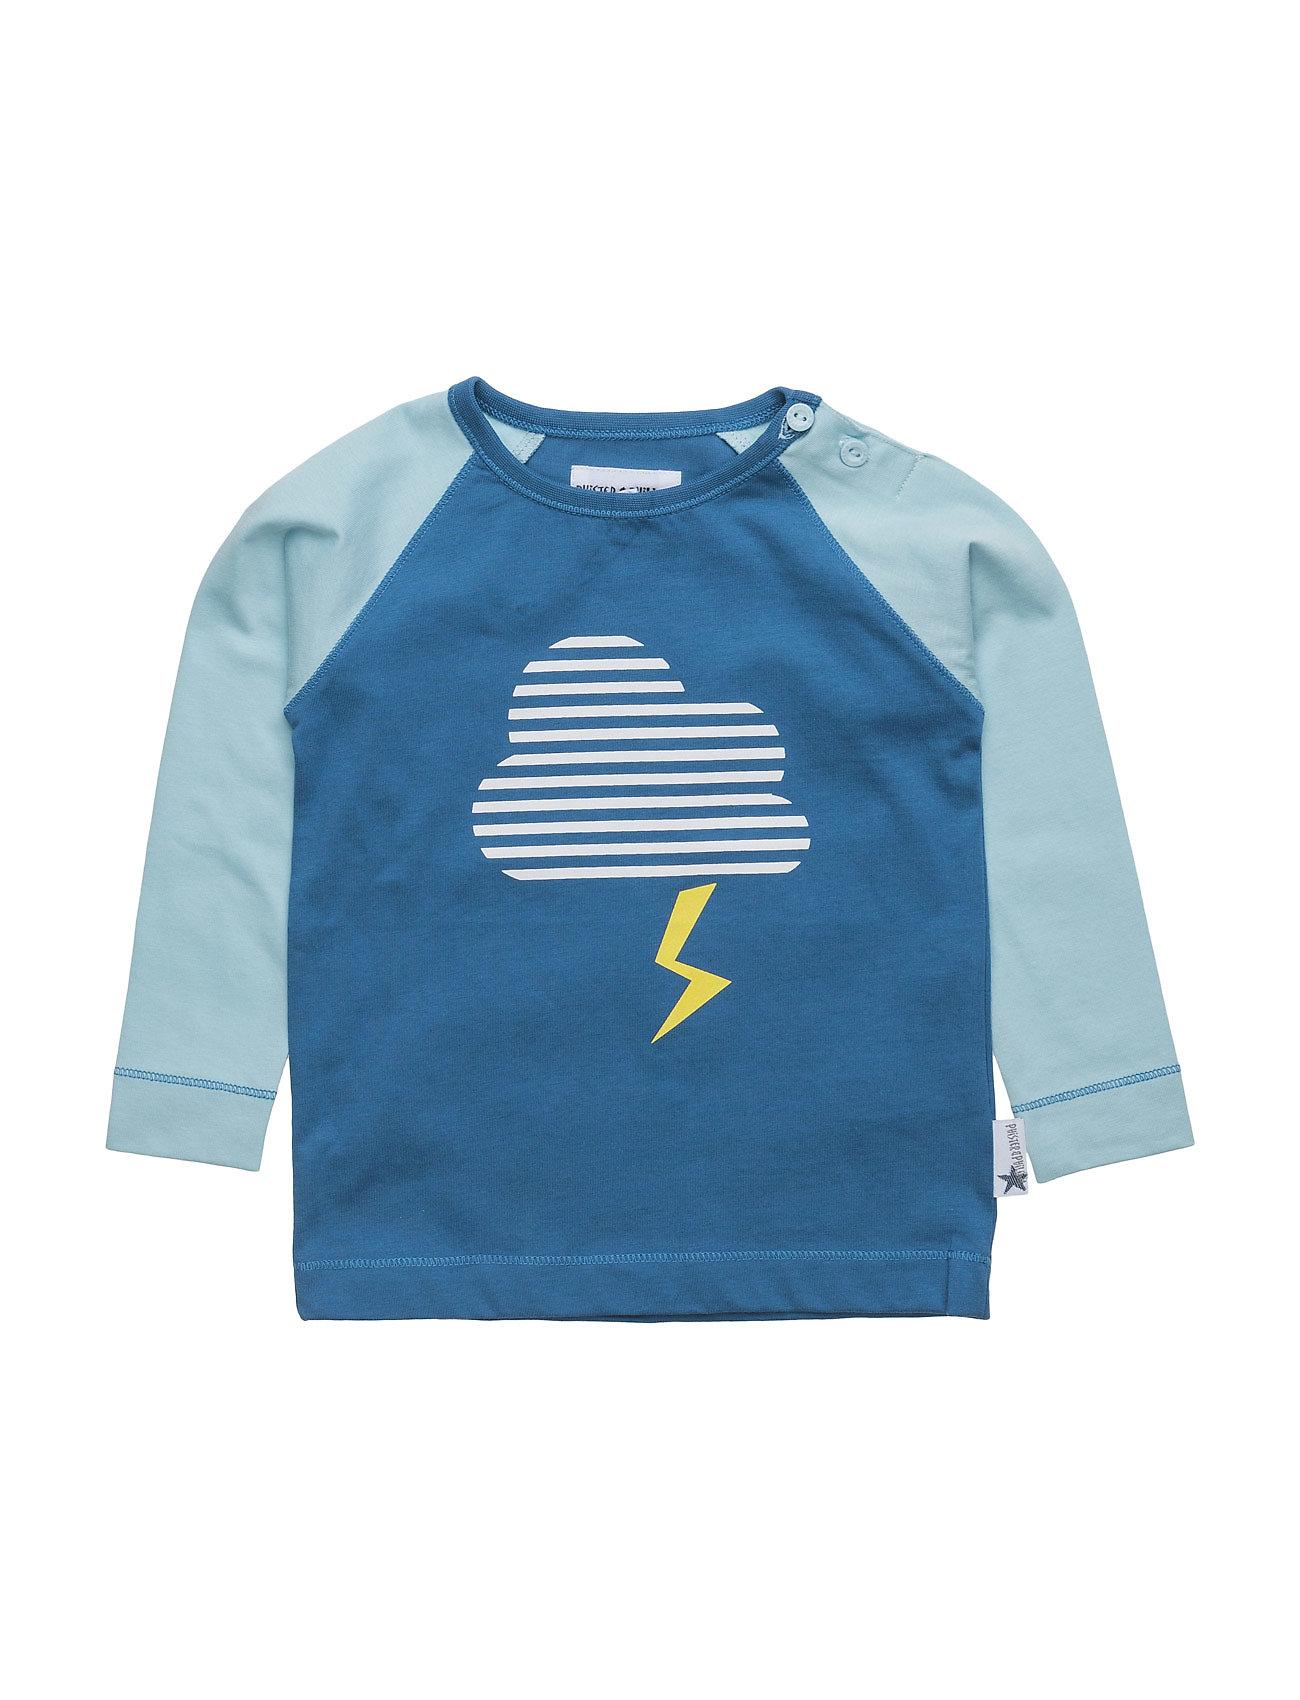 Jacob Single Top Phister & Philina T-shirts til Drenge i